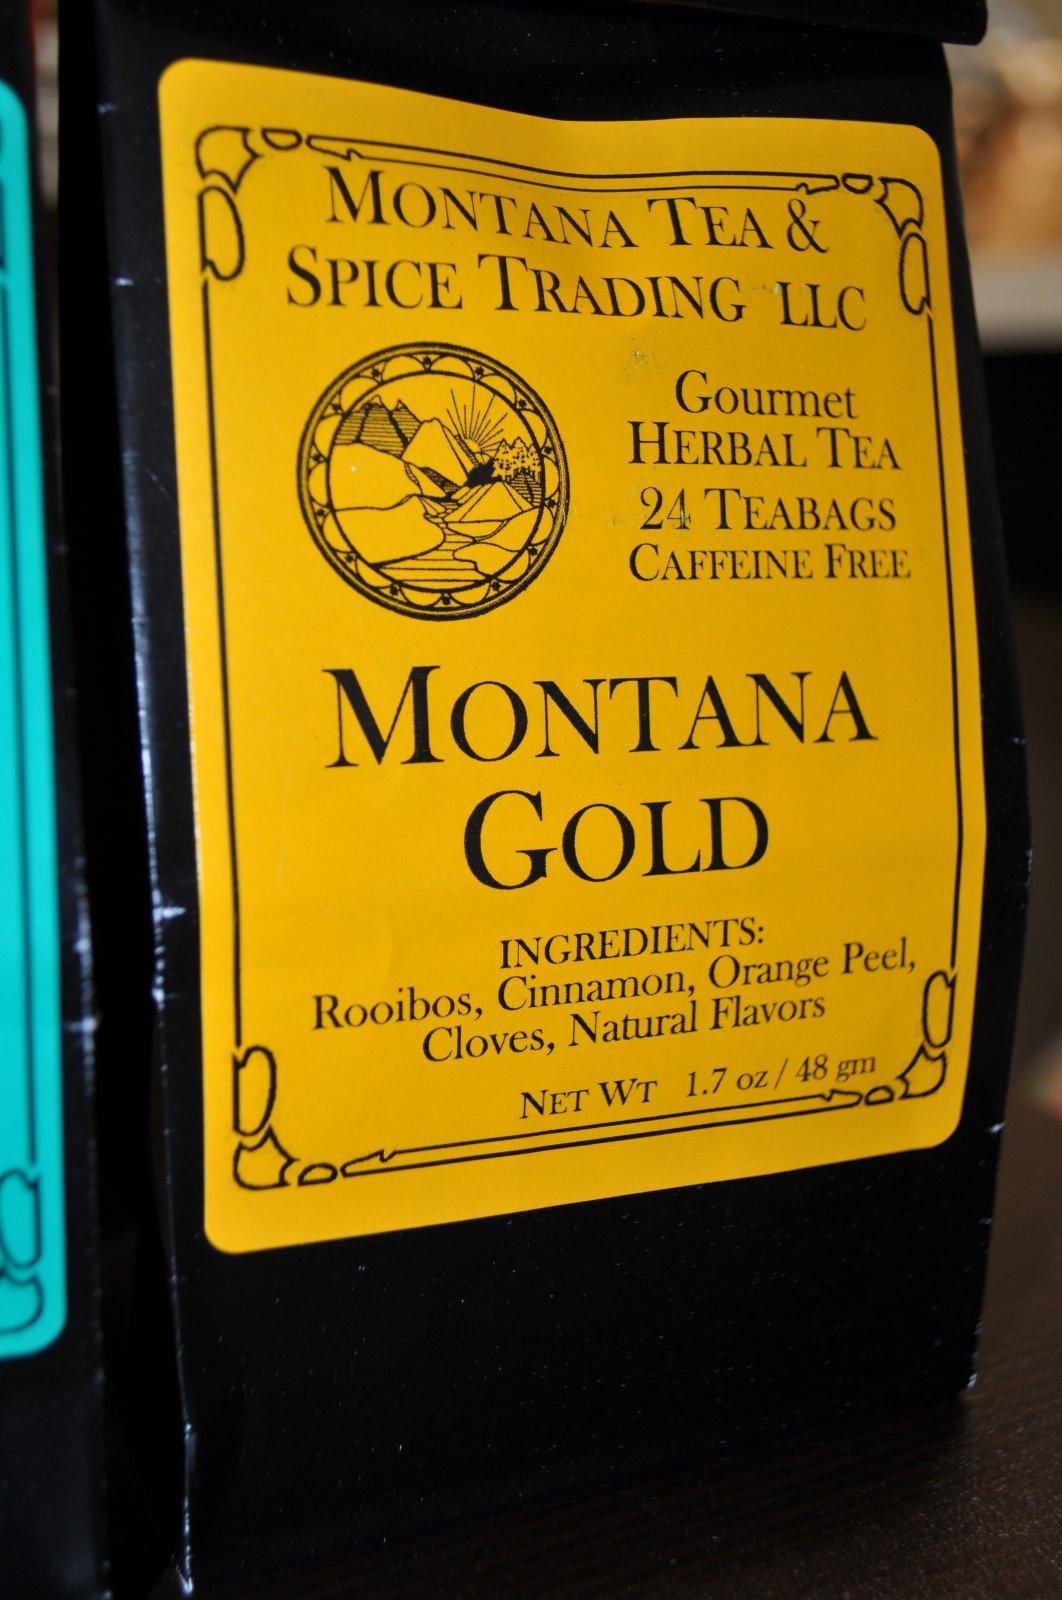 Montana Tea - Montana Gold